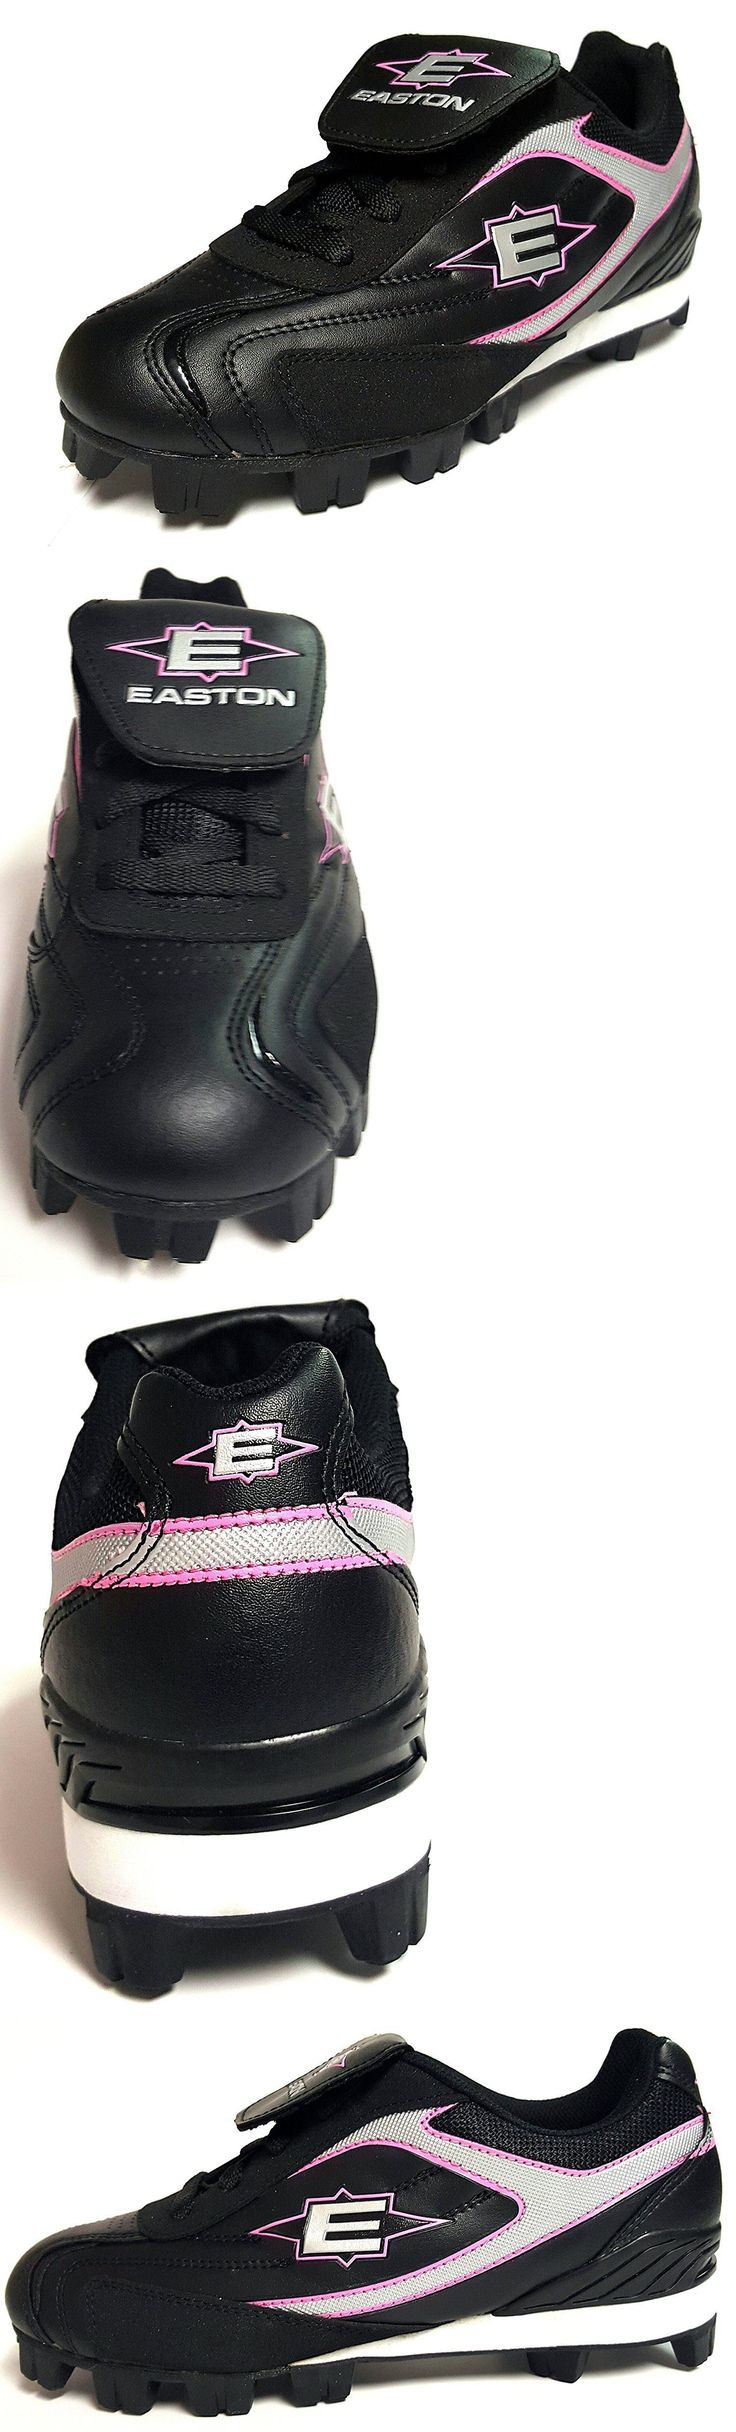 Womens 159060: Softball Cleats - Easton Women S Redline Lo, Black Silver Pink -> BUY IT NOW ONLY: $31.99 on eBay!